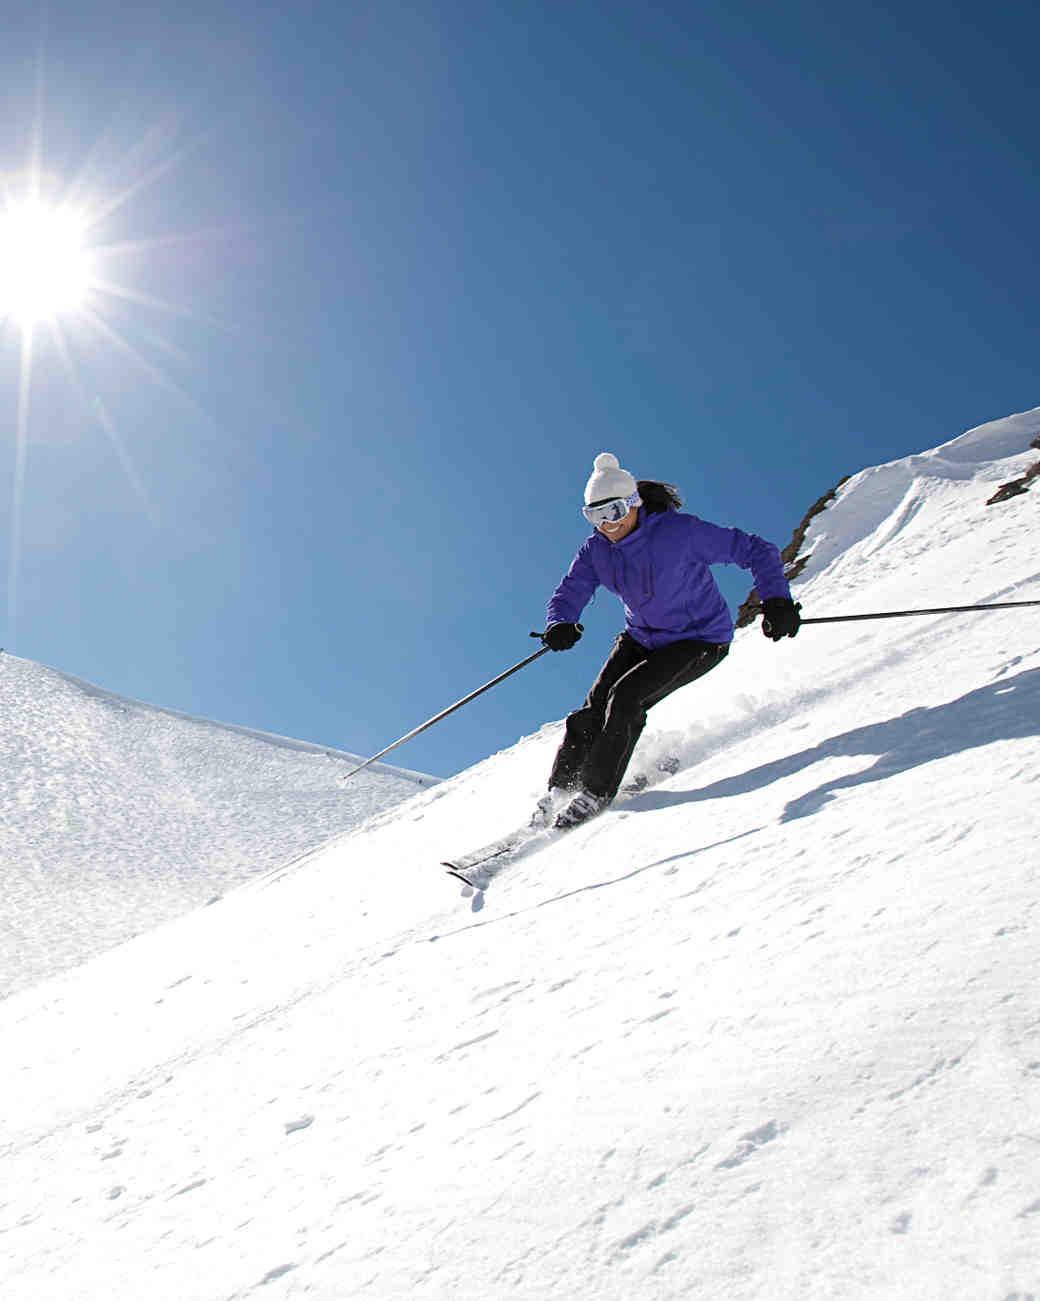 downhill-skiing-s111598-108226350-medium.jpg